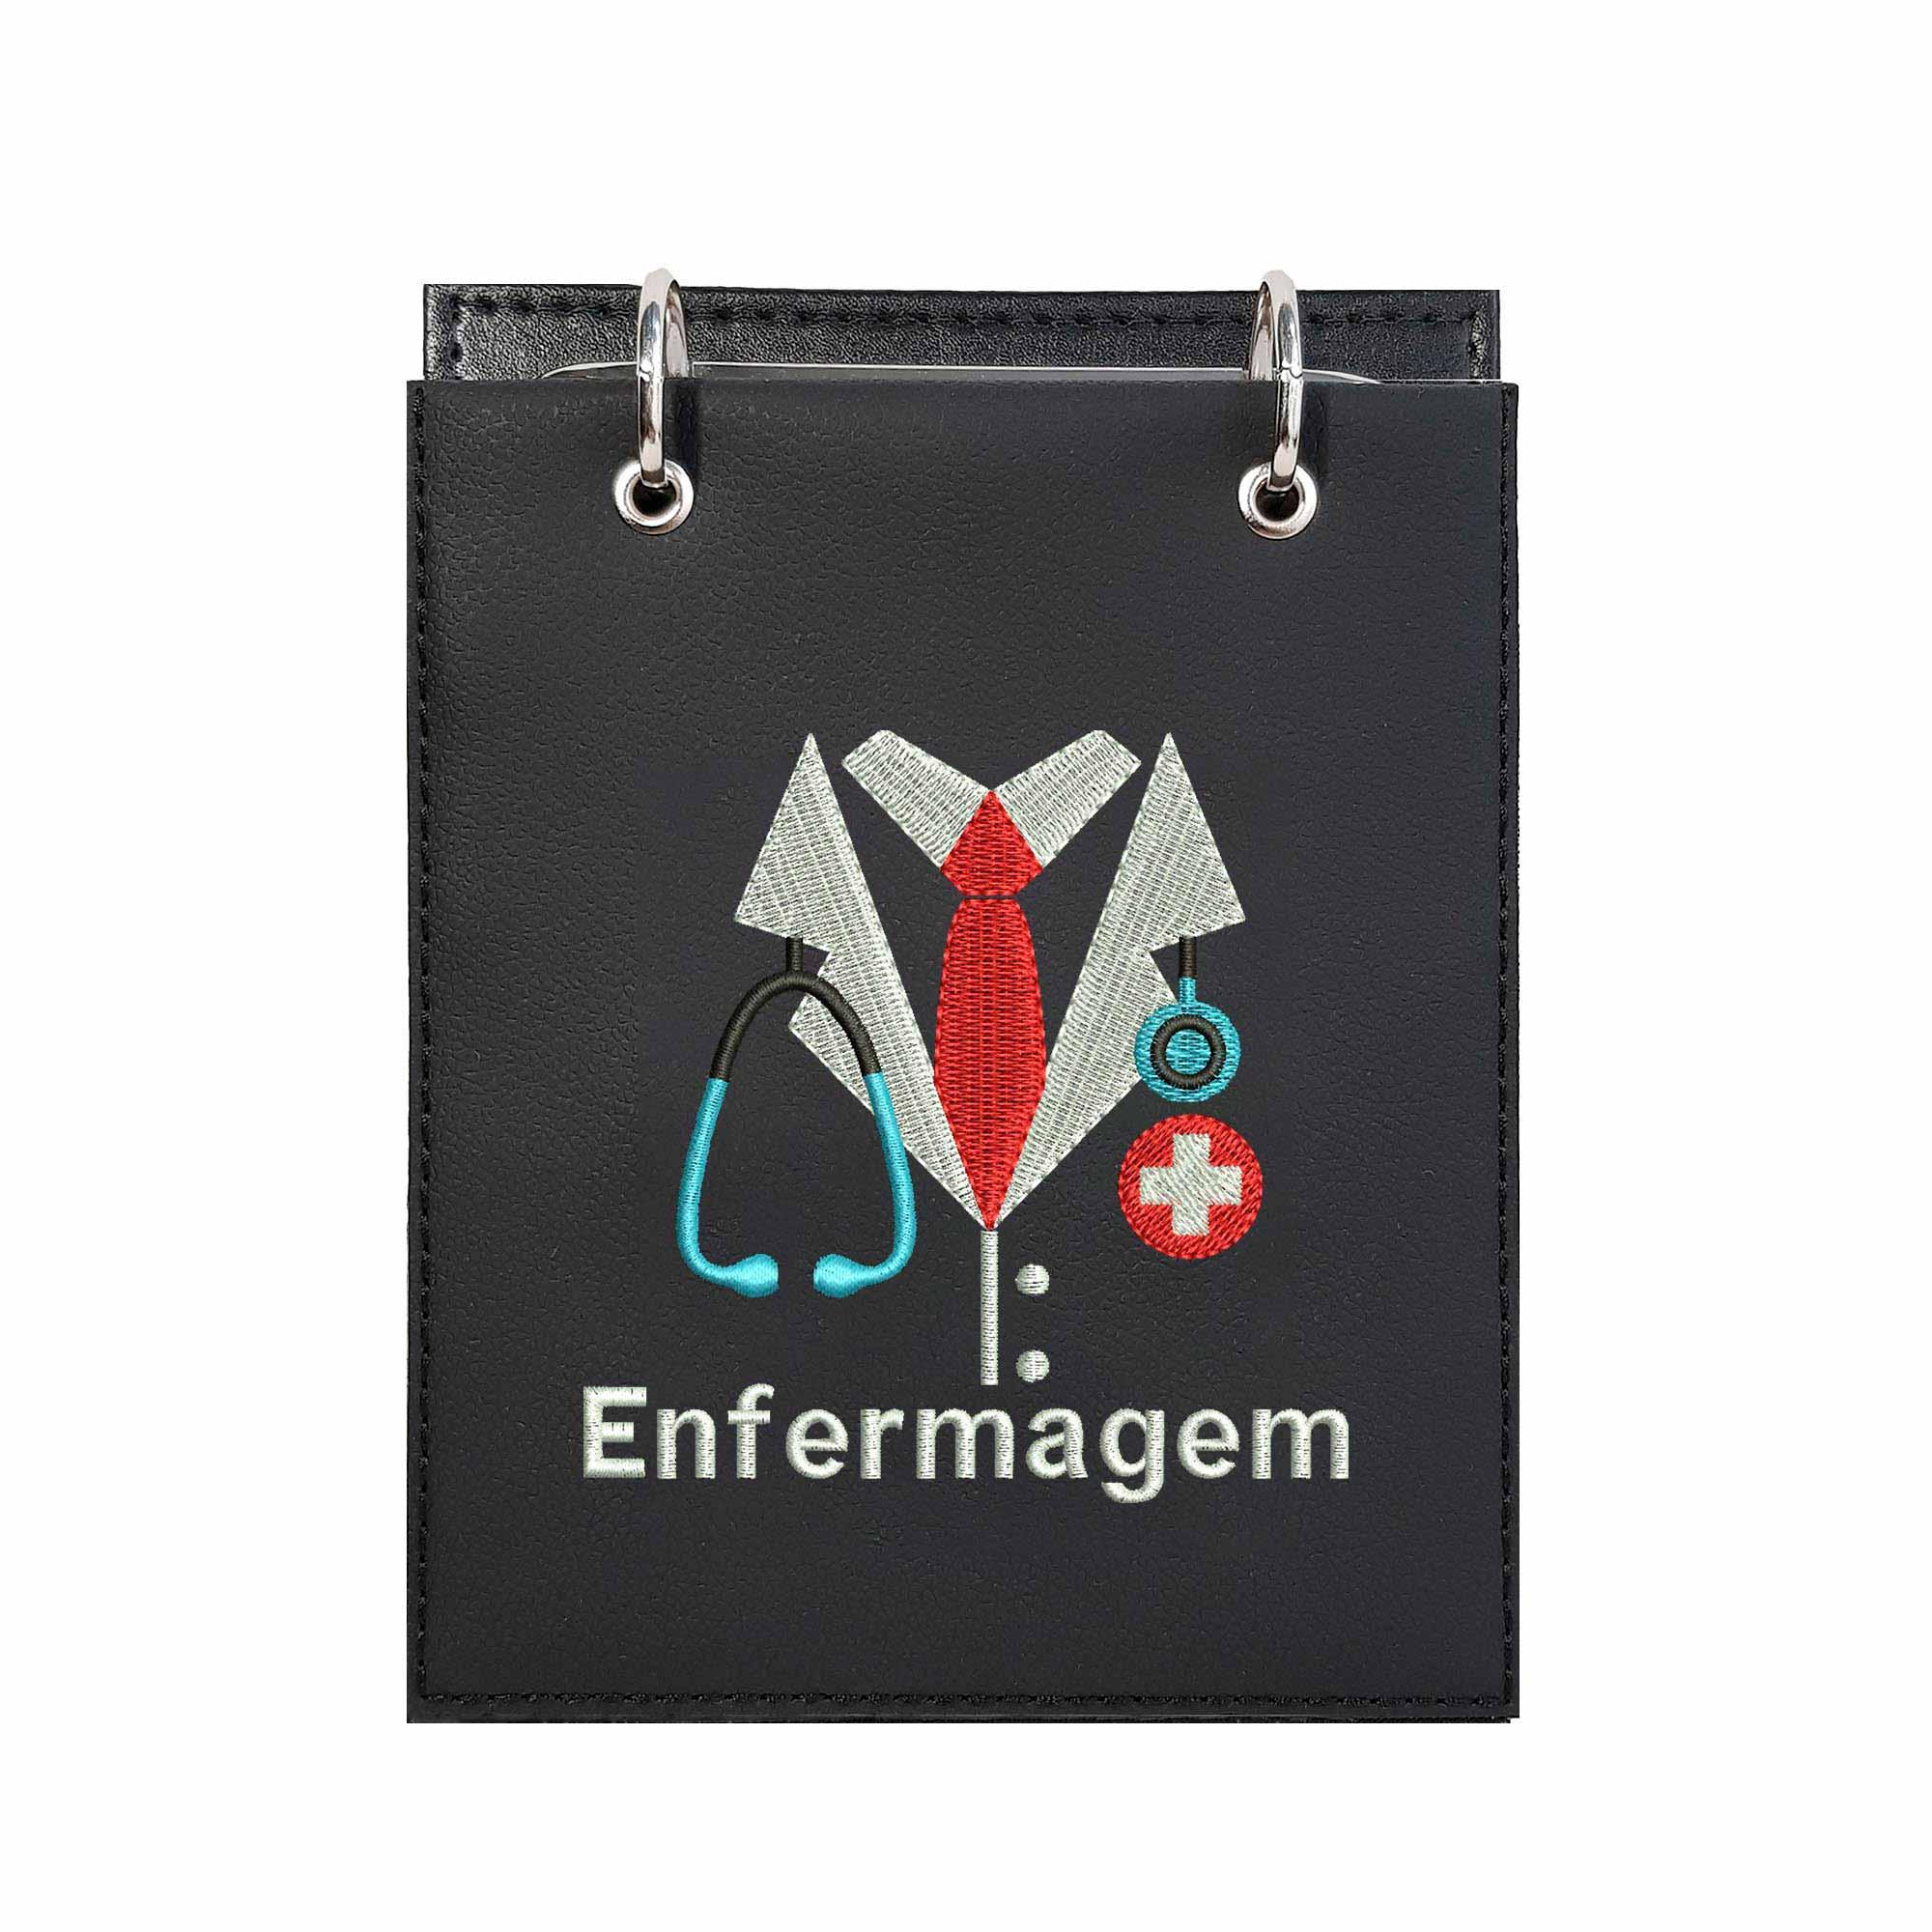 Bloco Bordado de Mesa Notas Design Logo Enfermagem  - Talysmã Bordados